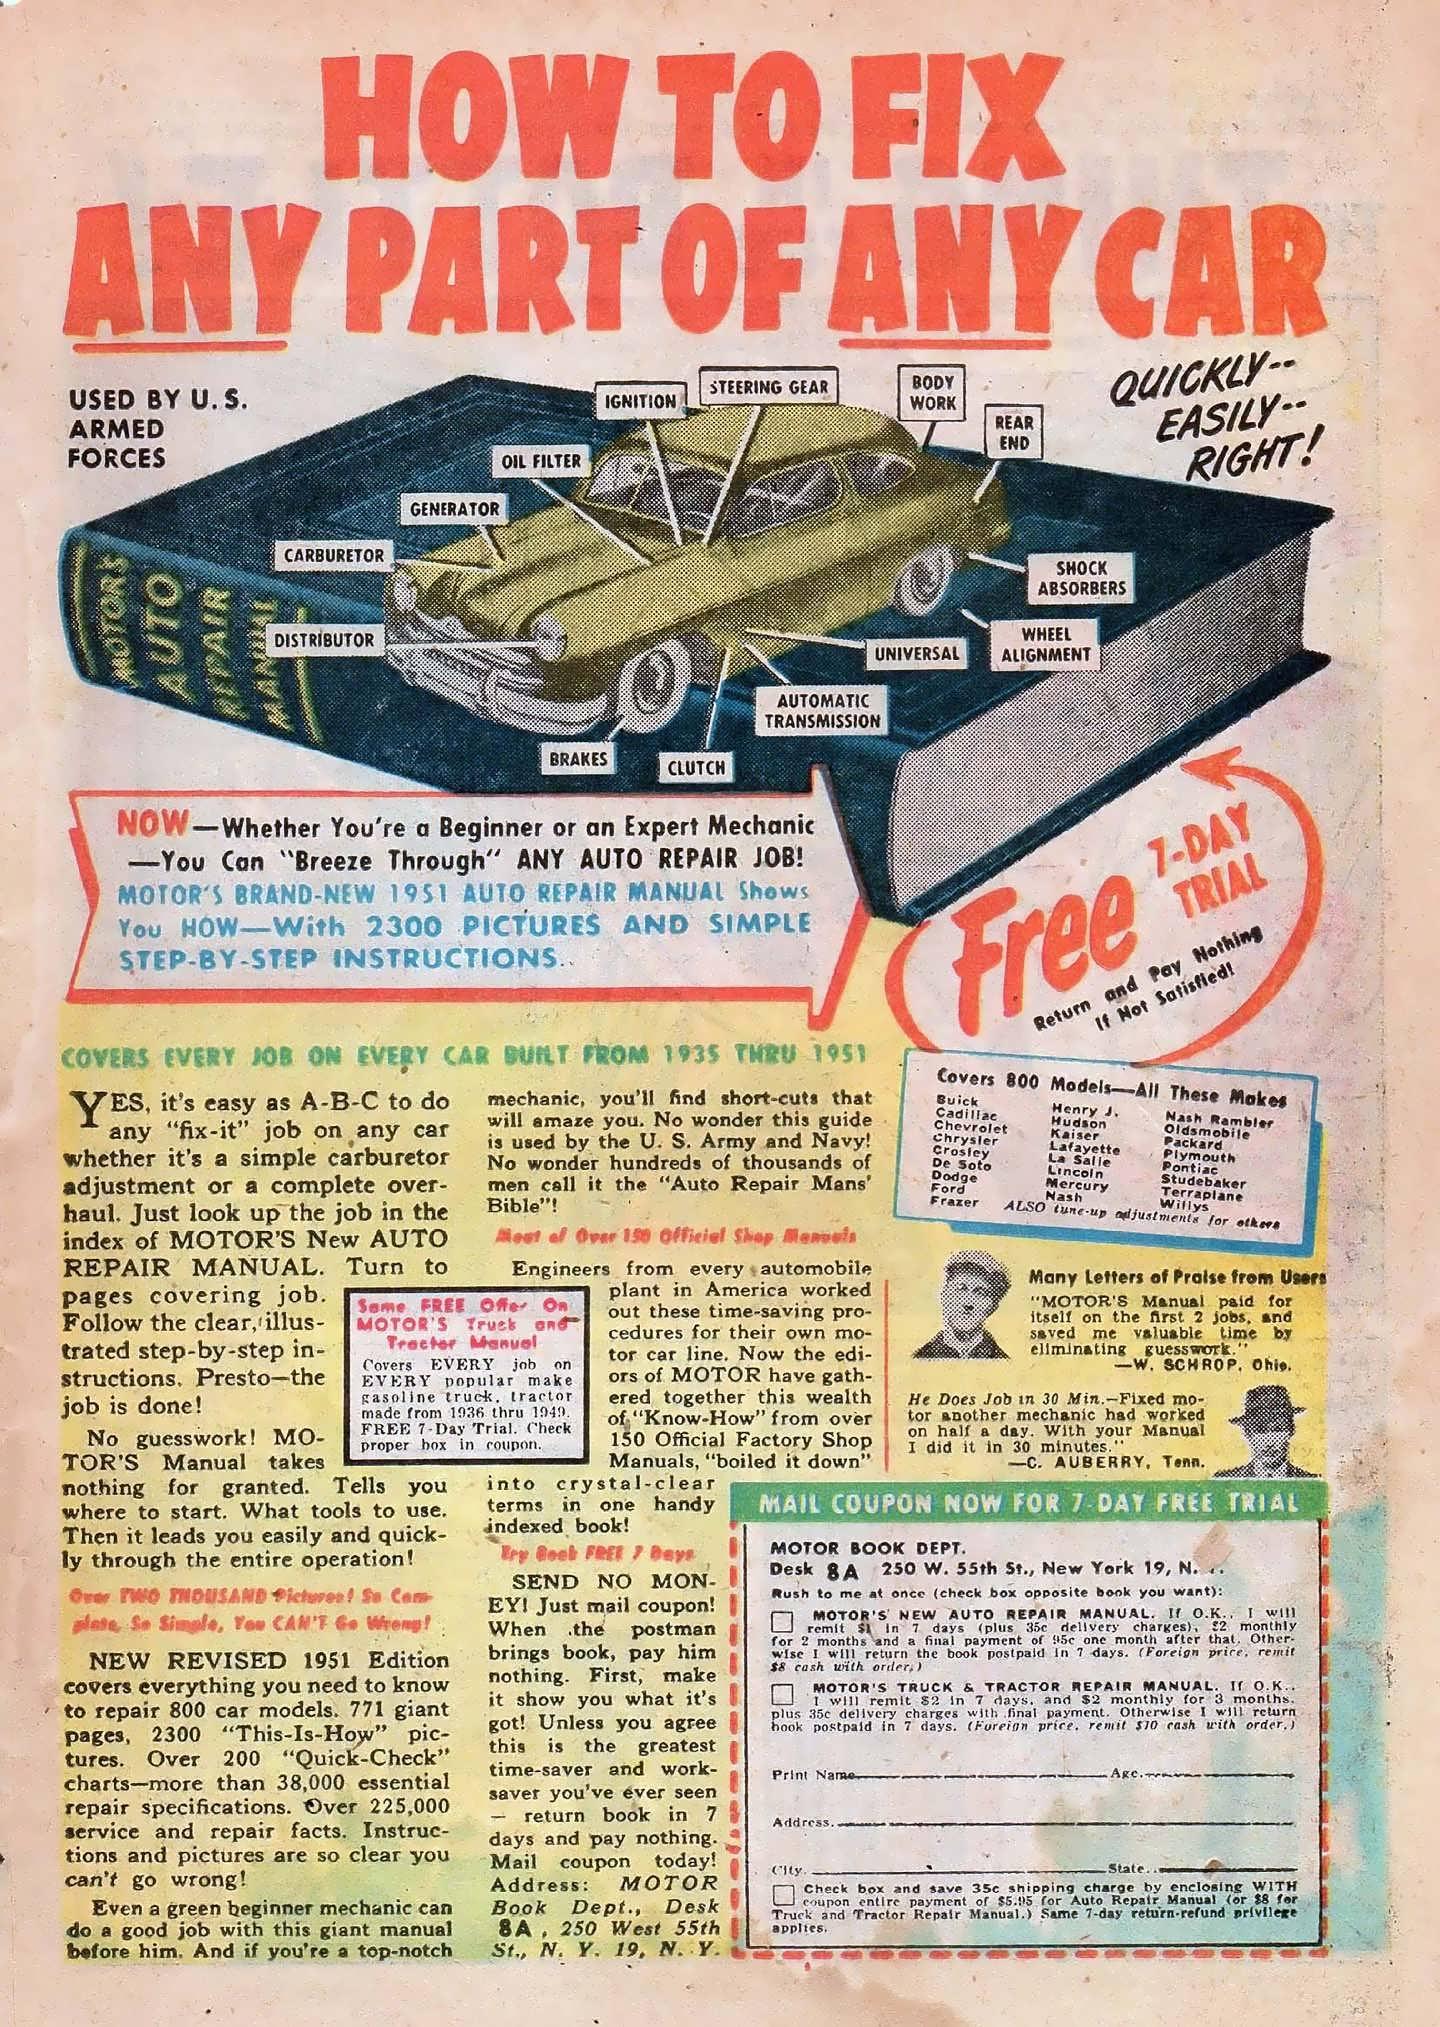 Read online Adventures into Weird Worlds comic -  Issue #2 - 21